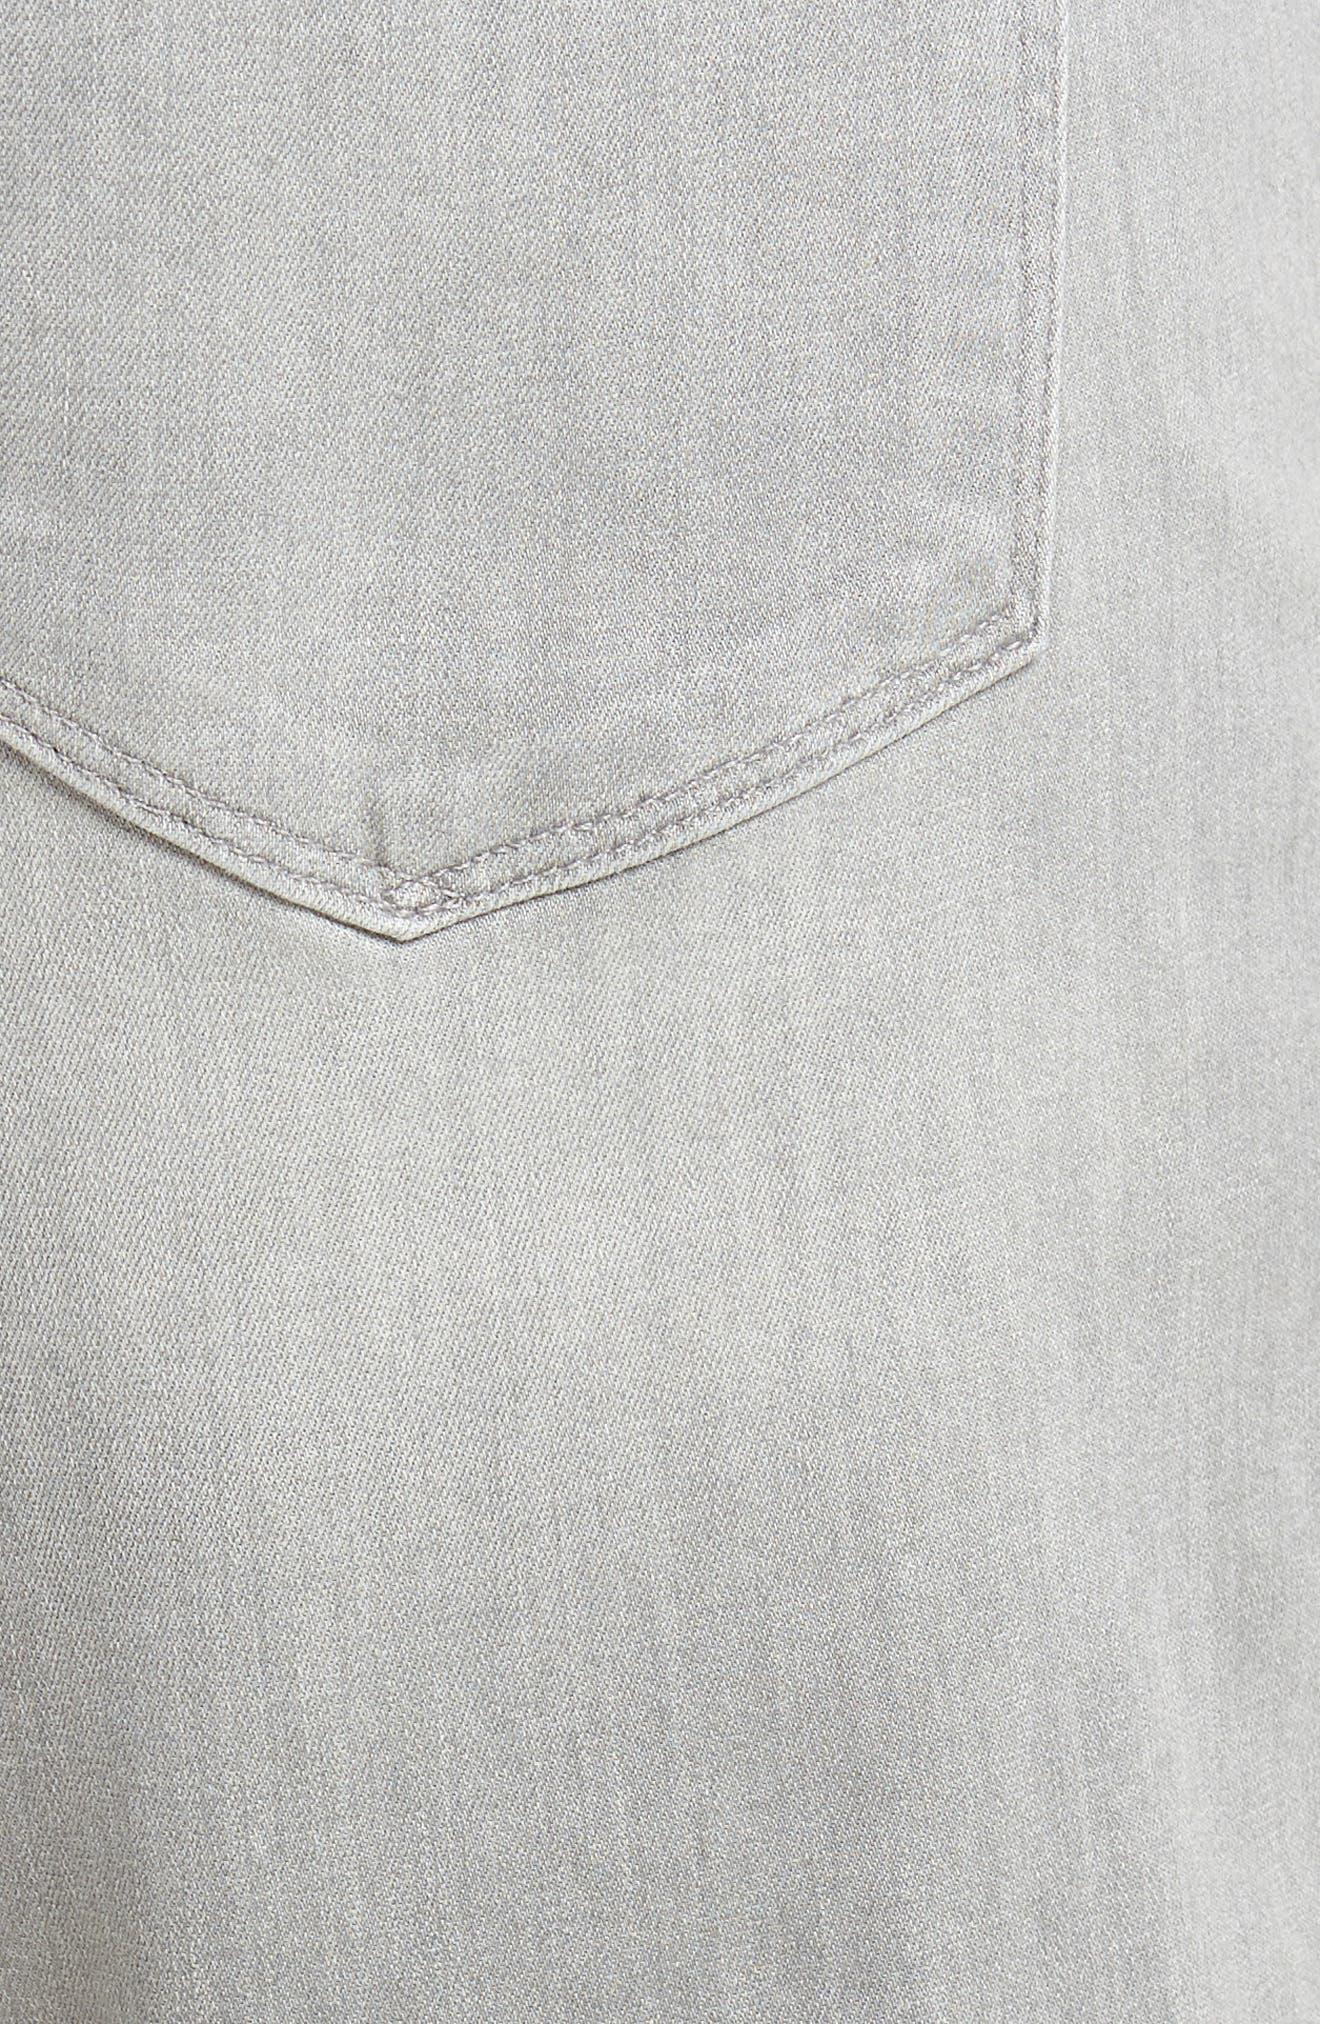 Transcend - Lennox Slim Fit Jeans,                             Alternate thumbnail 5, color,                             Mannor